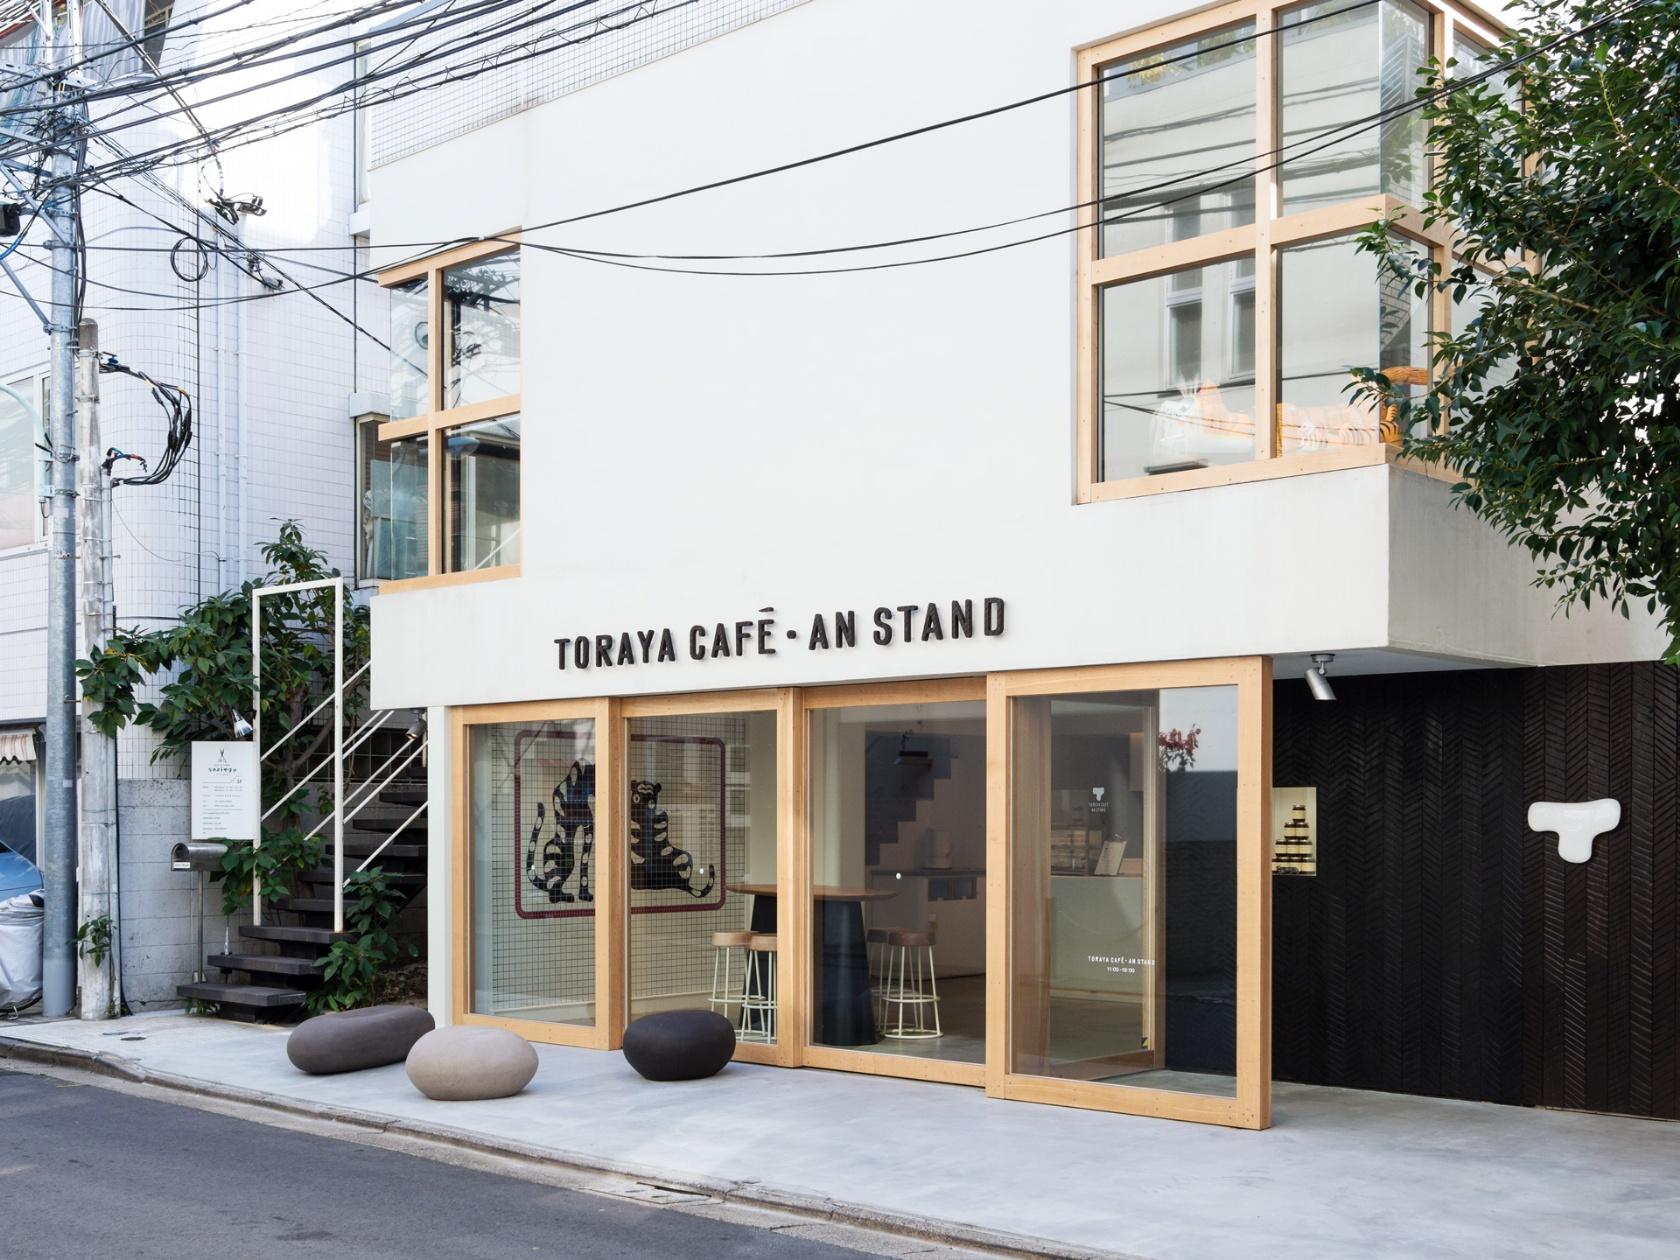 Toraya Cafe - An Stand